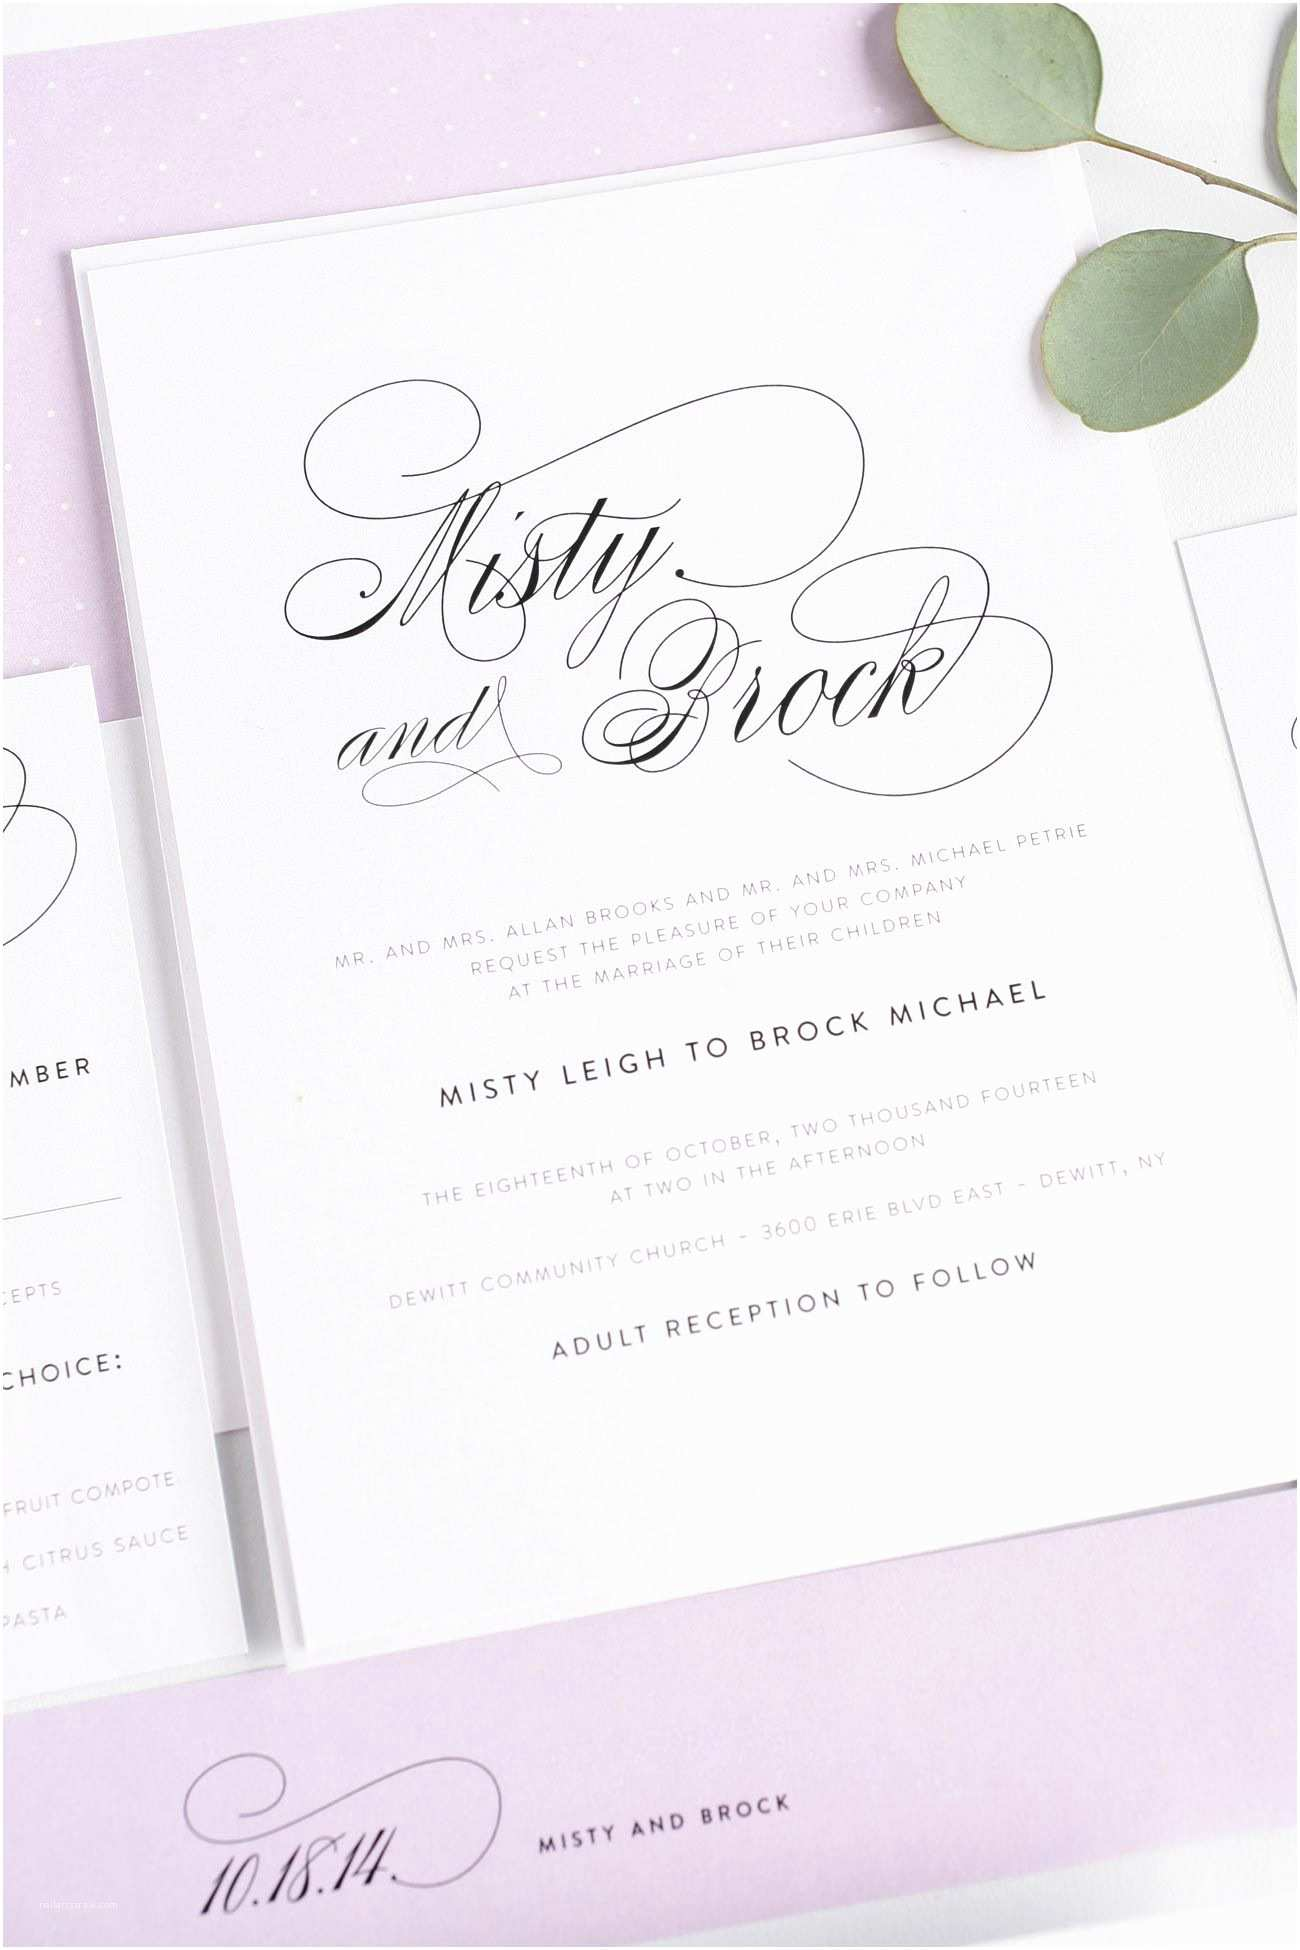 Envelope Etiquette  Wedding Invitations Wedding Invitation Envelope Etiquette Wording Yaseen